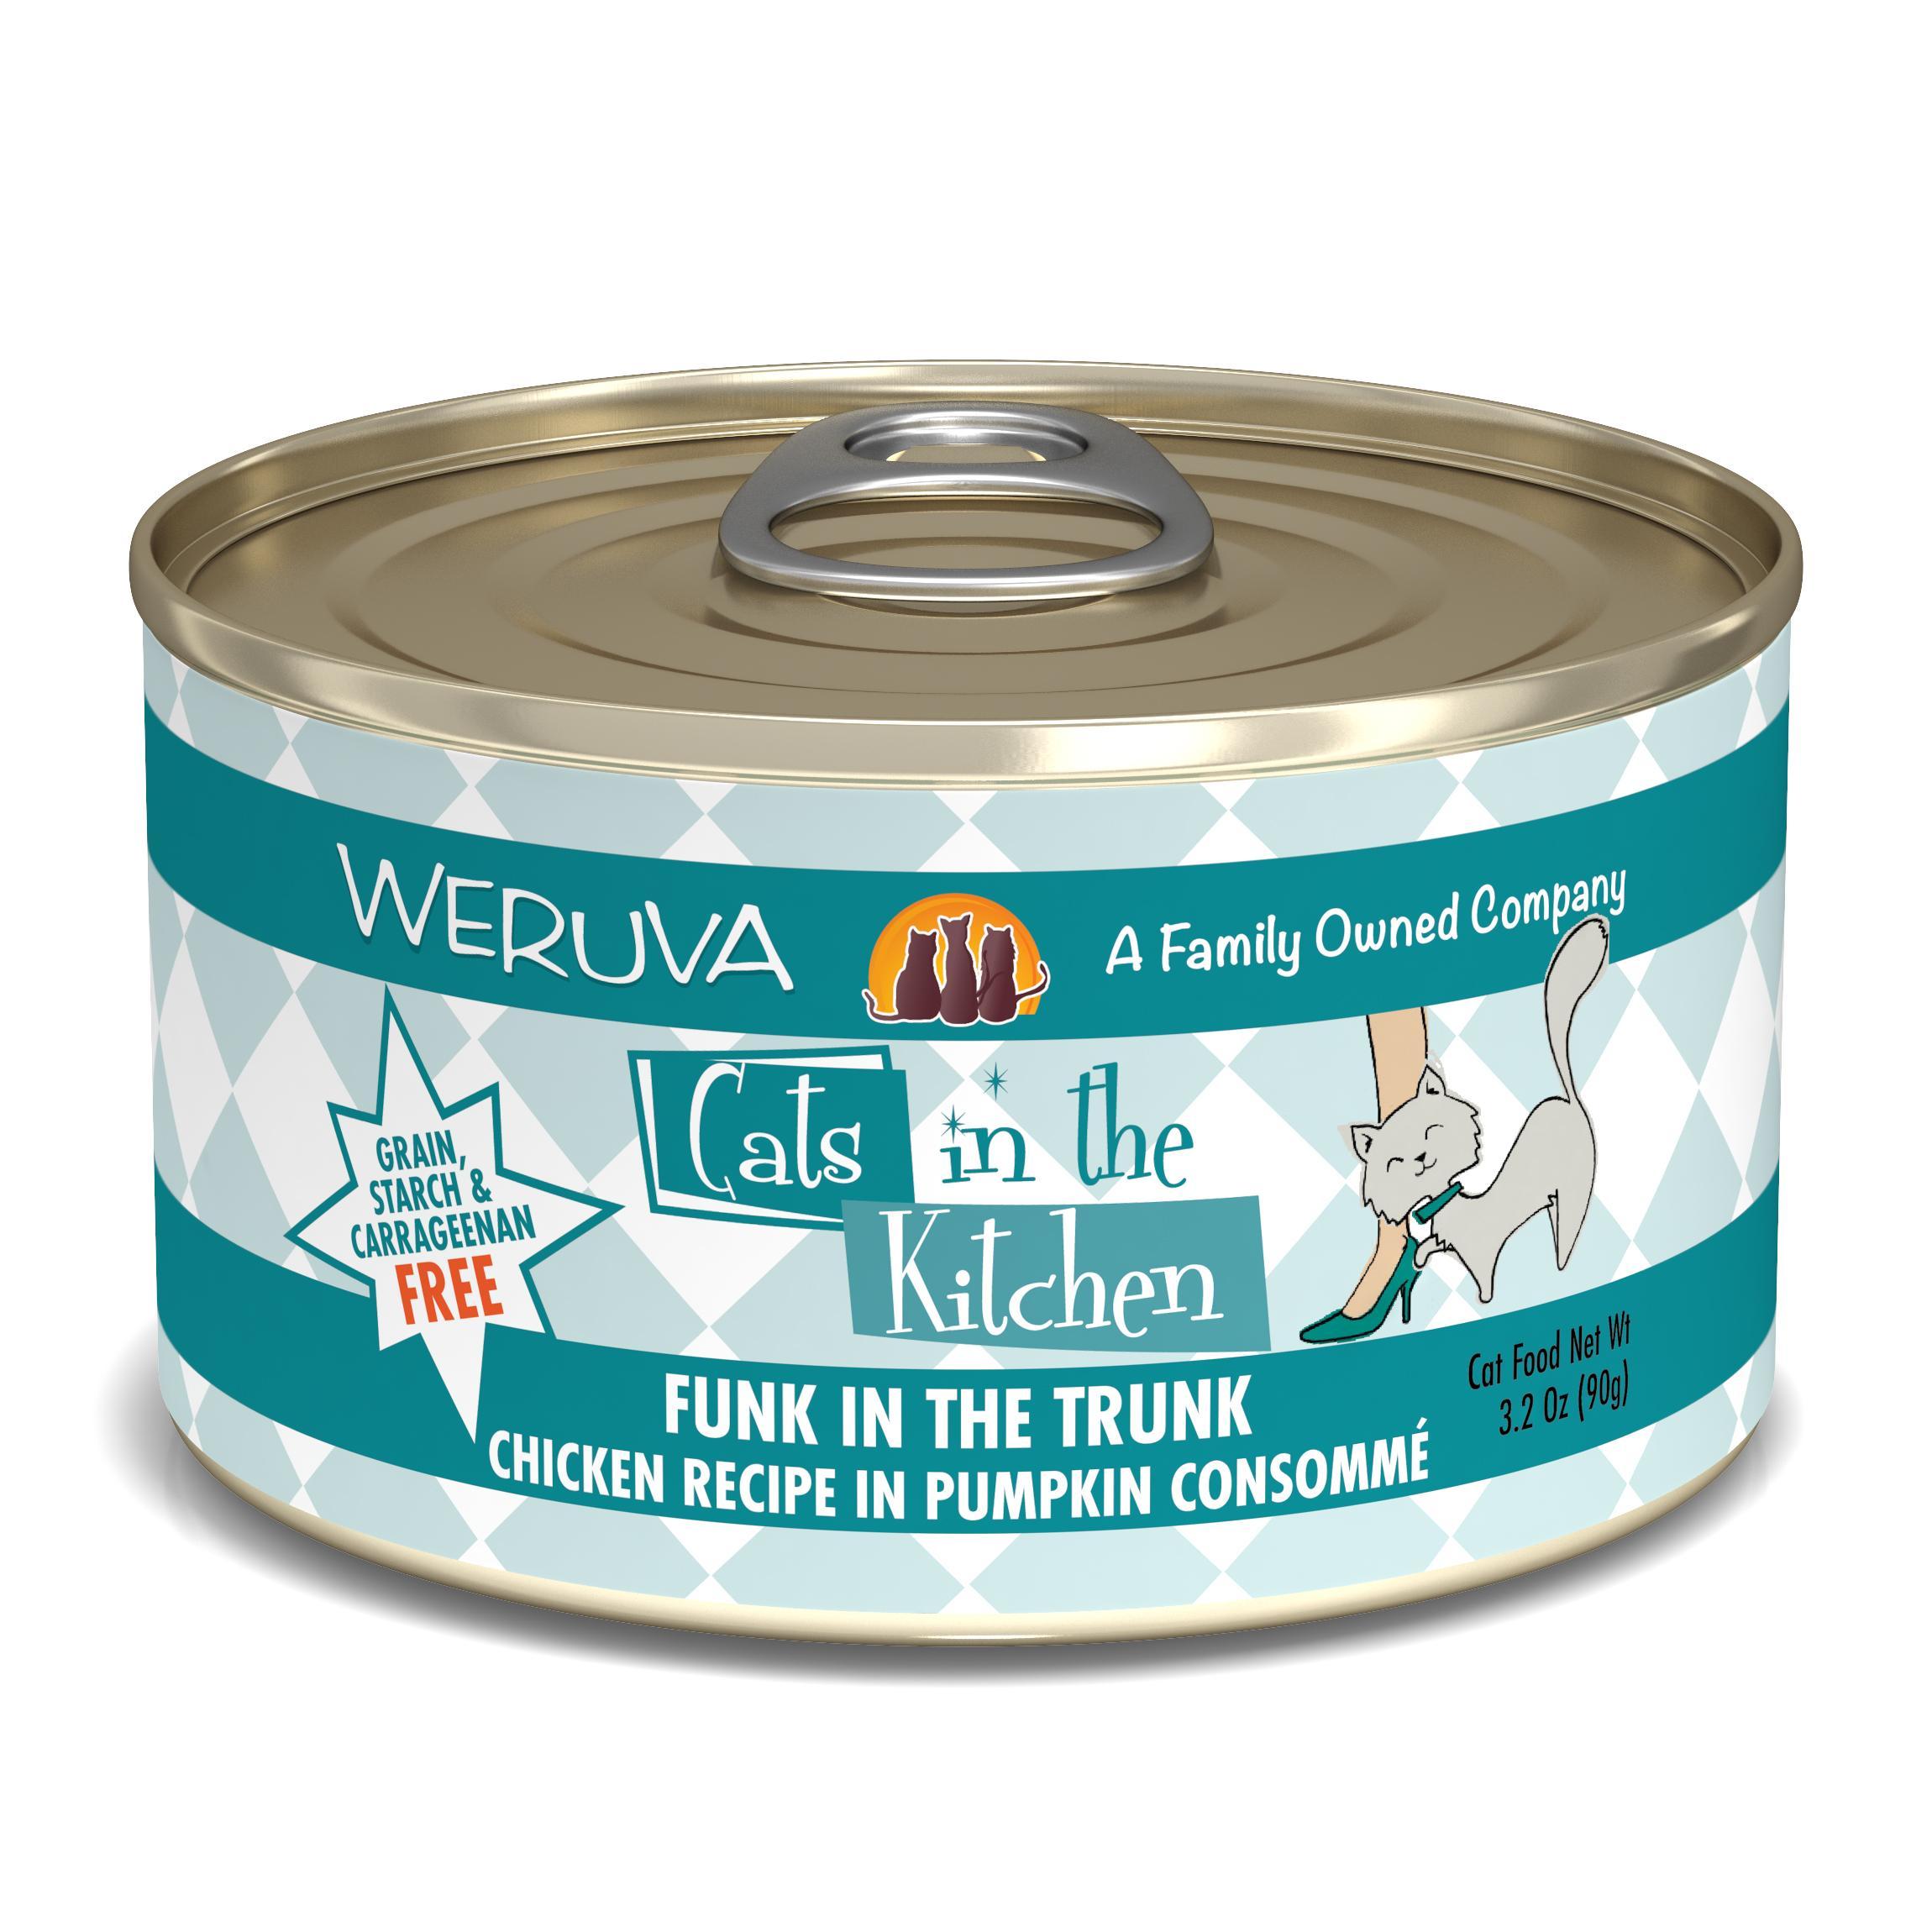 Weruva Cats in the Kitchen Funk In The Trunk Chicken in Pumpkin Consomme Grain-Free Wet Cat Food, 3.2-oz